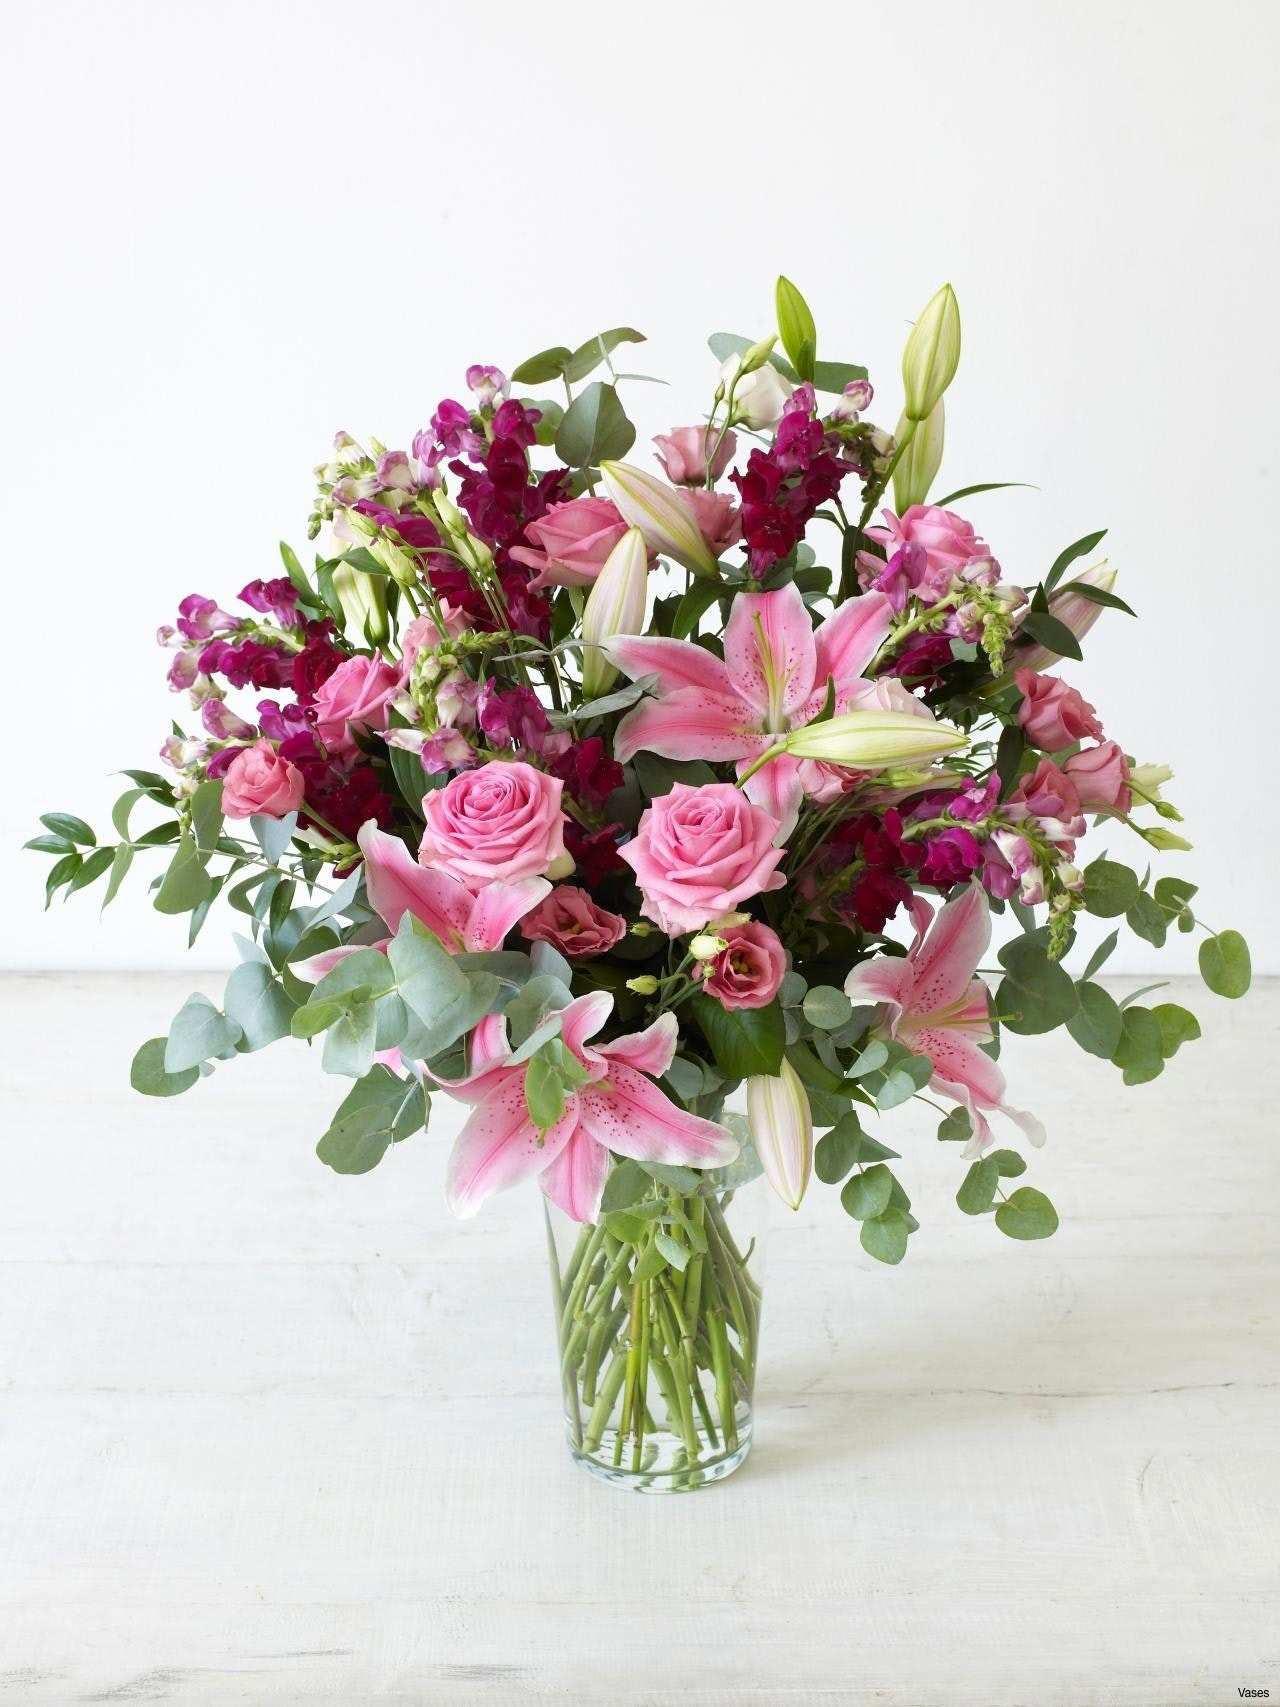 Flower Garden Ideas Elegant Flower Arrangements Elegant Floral Arrangements 0d Design Ideas Best